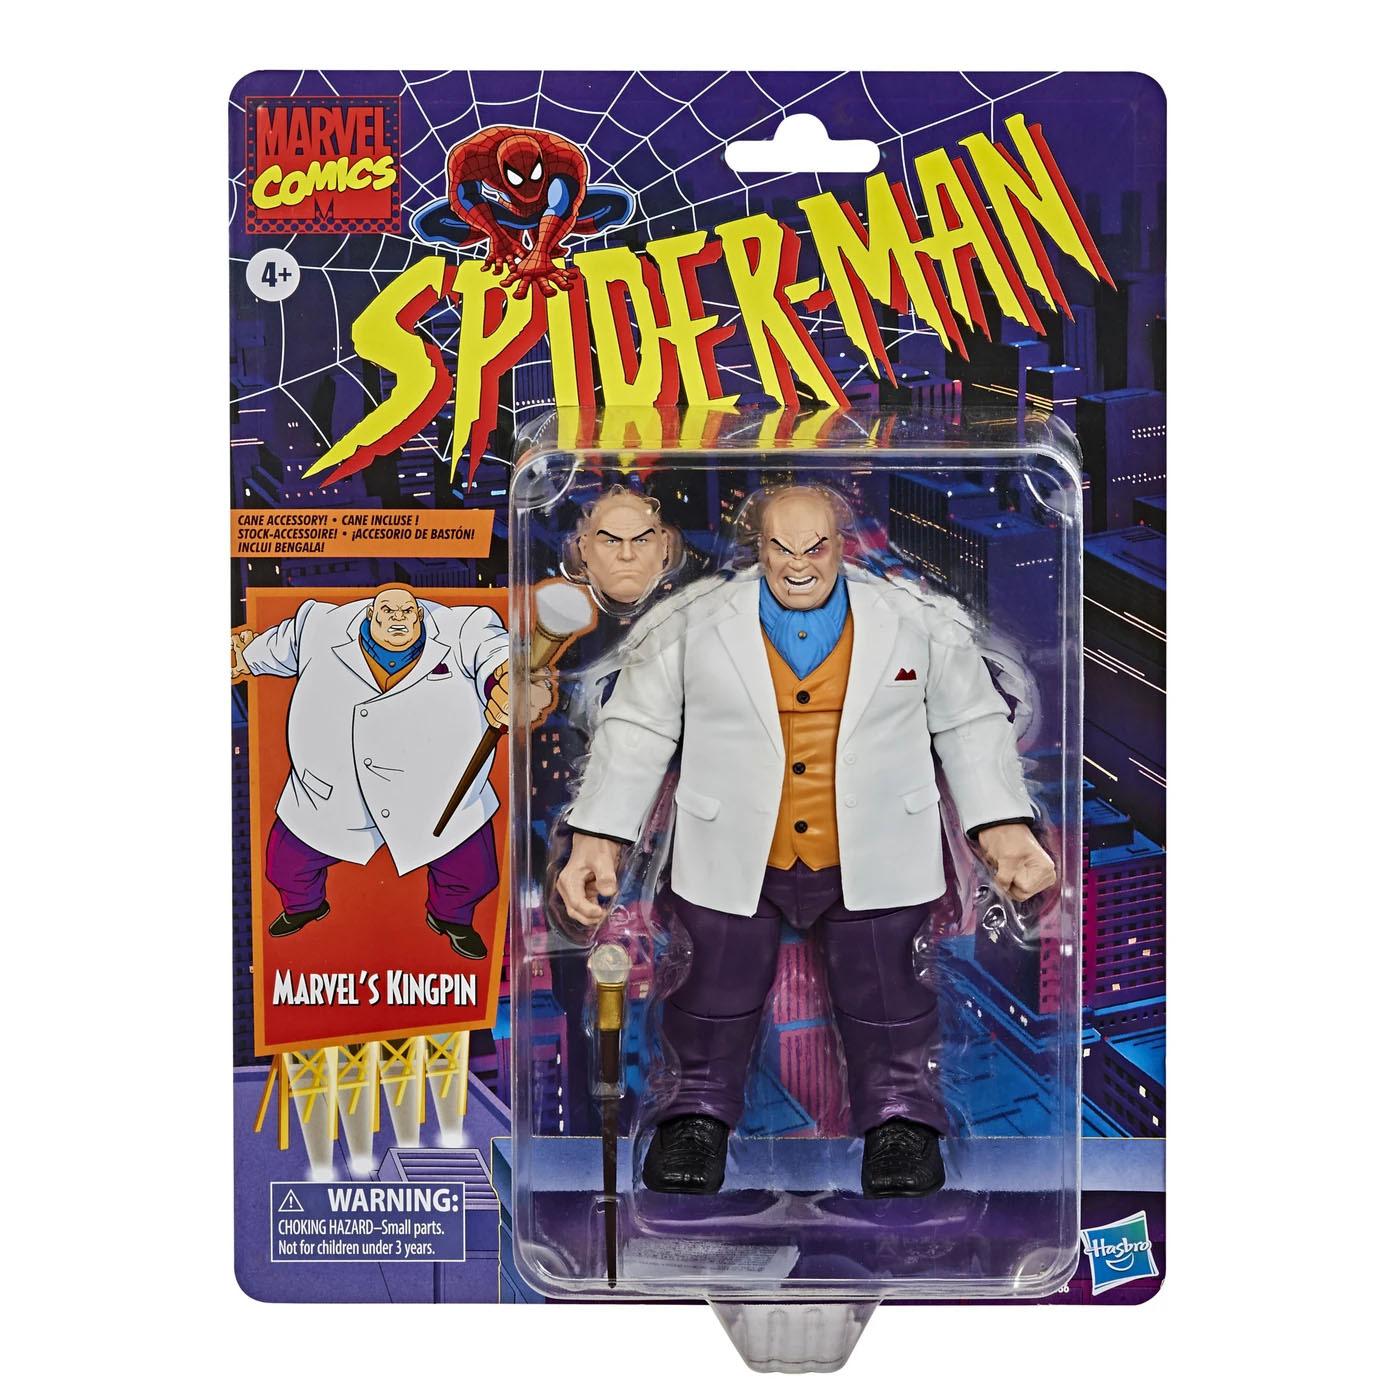 Spider-Man Hasbro Marvel Legends 6-inch Gwen Stacy Action Figure Toy Retro